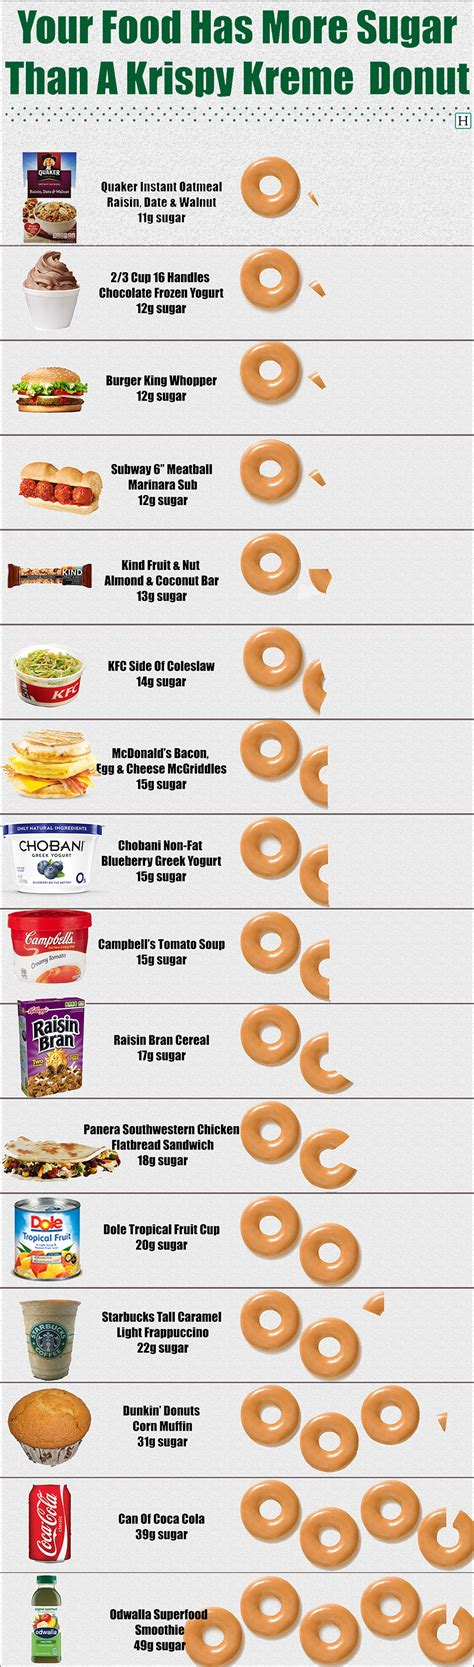 dunkin donuts light menu dunkin donuts calorie chart dunkin donuts breakfast